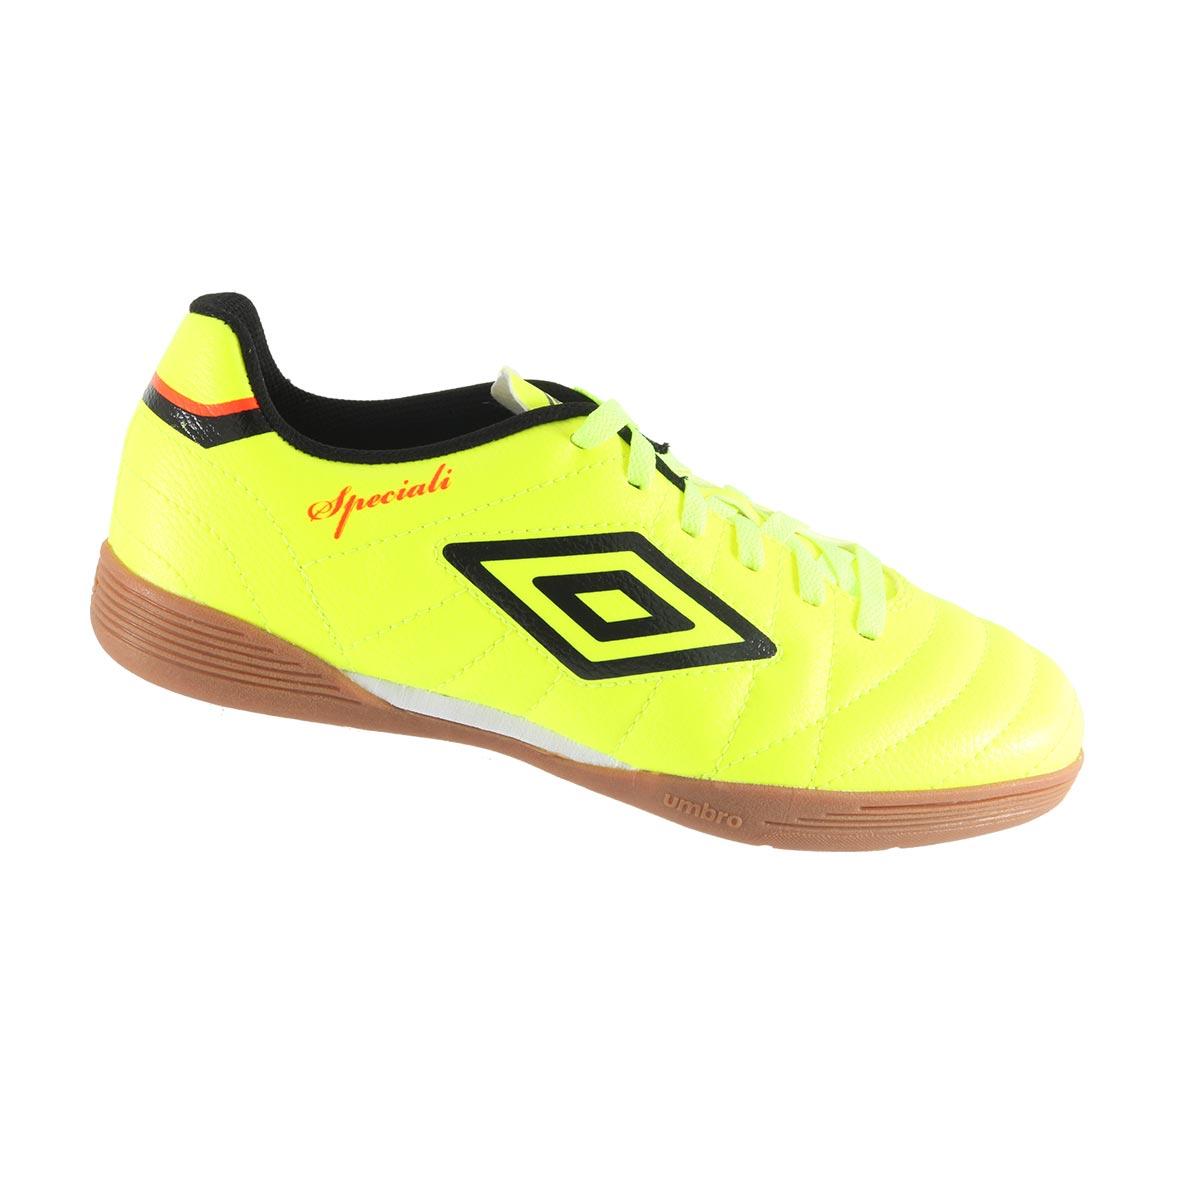 a94d6697d7 Chuteira Futsal Umbro Masculino Speciali Club 0F72057 - Ian Calçados